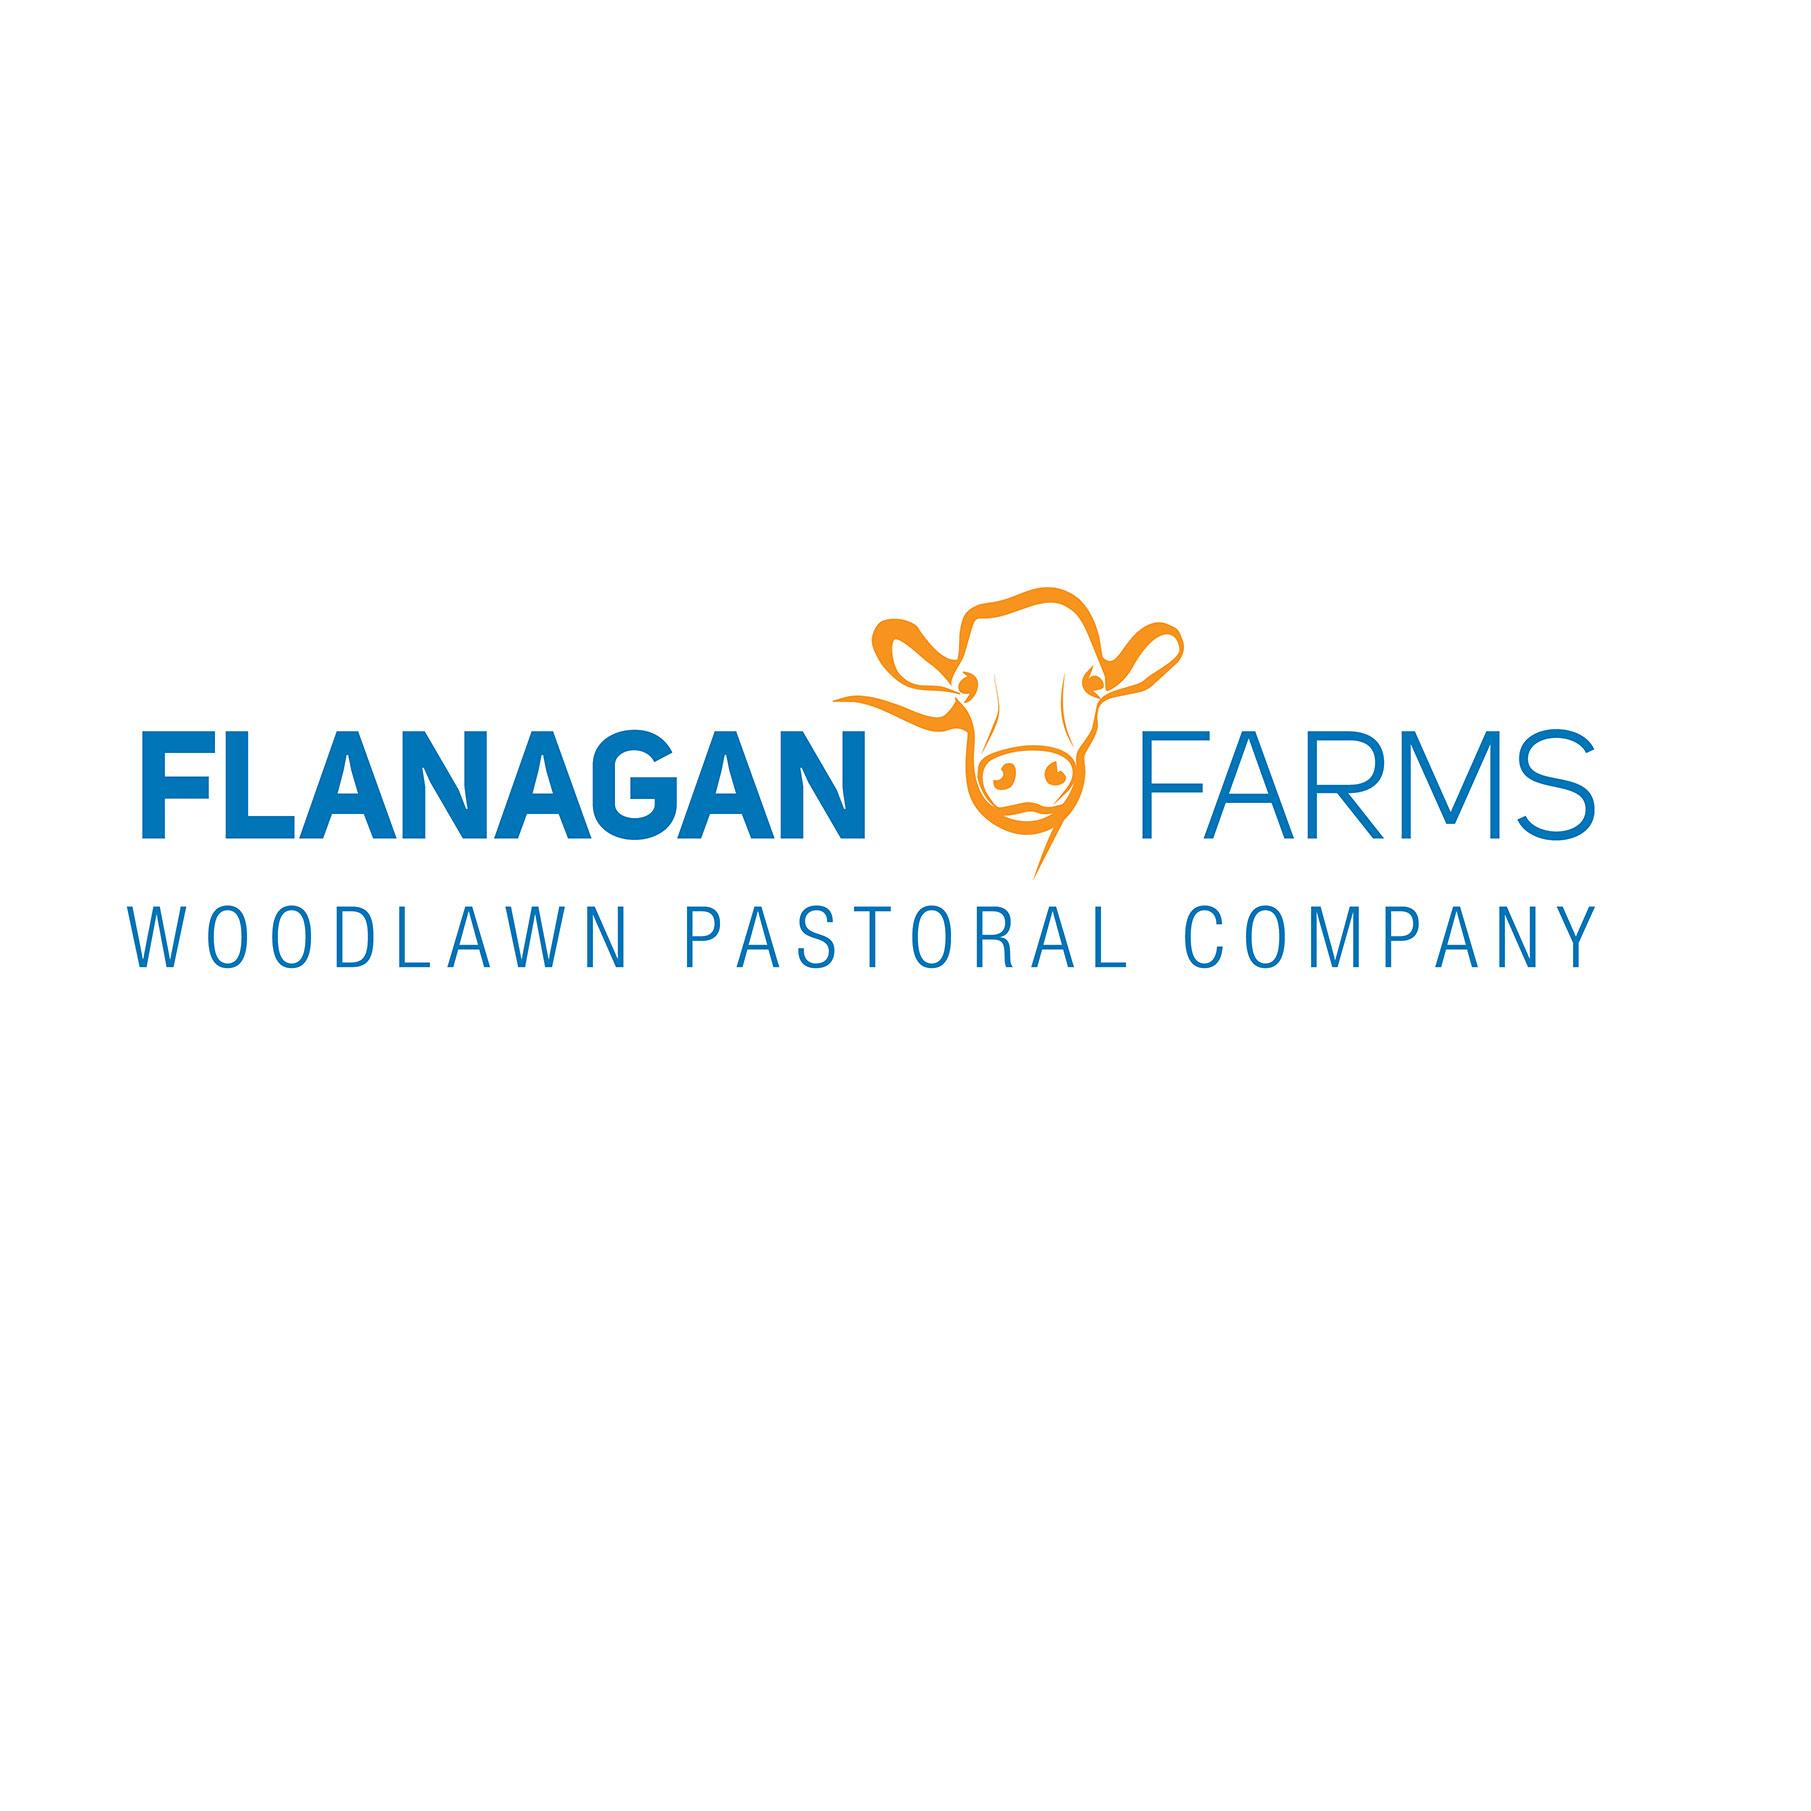 Flanagan-Farms